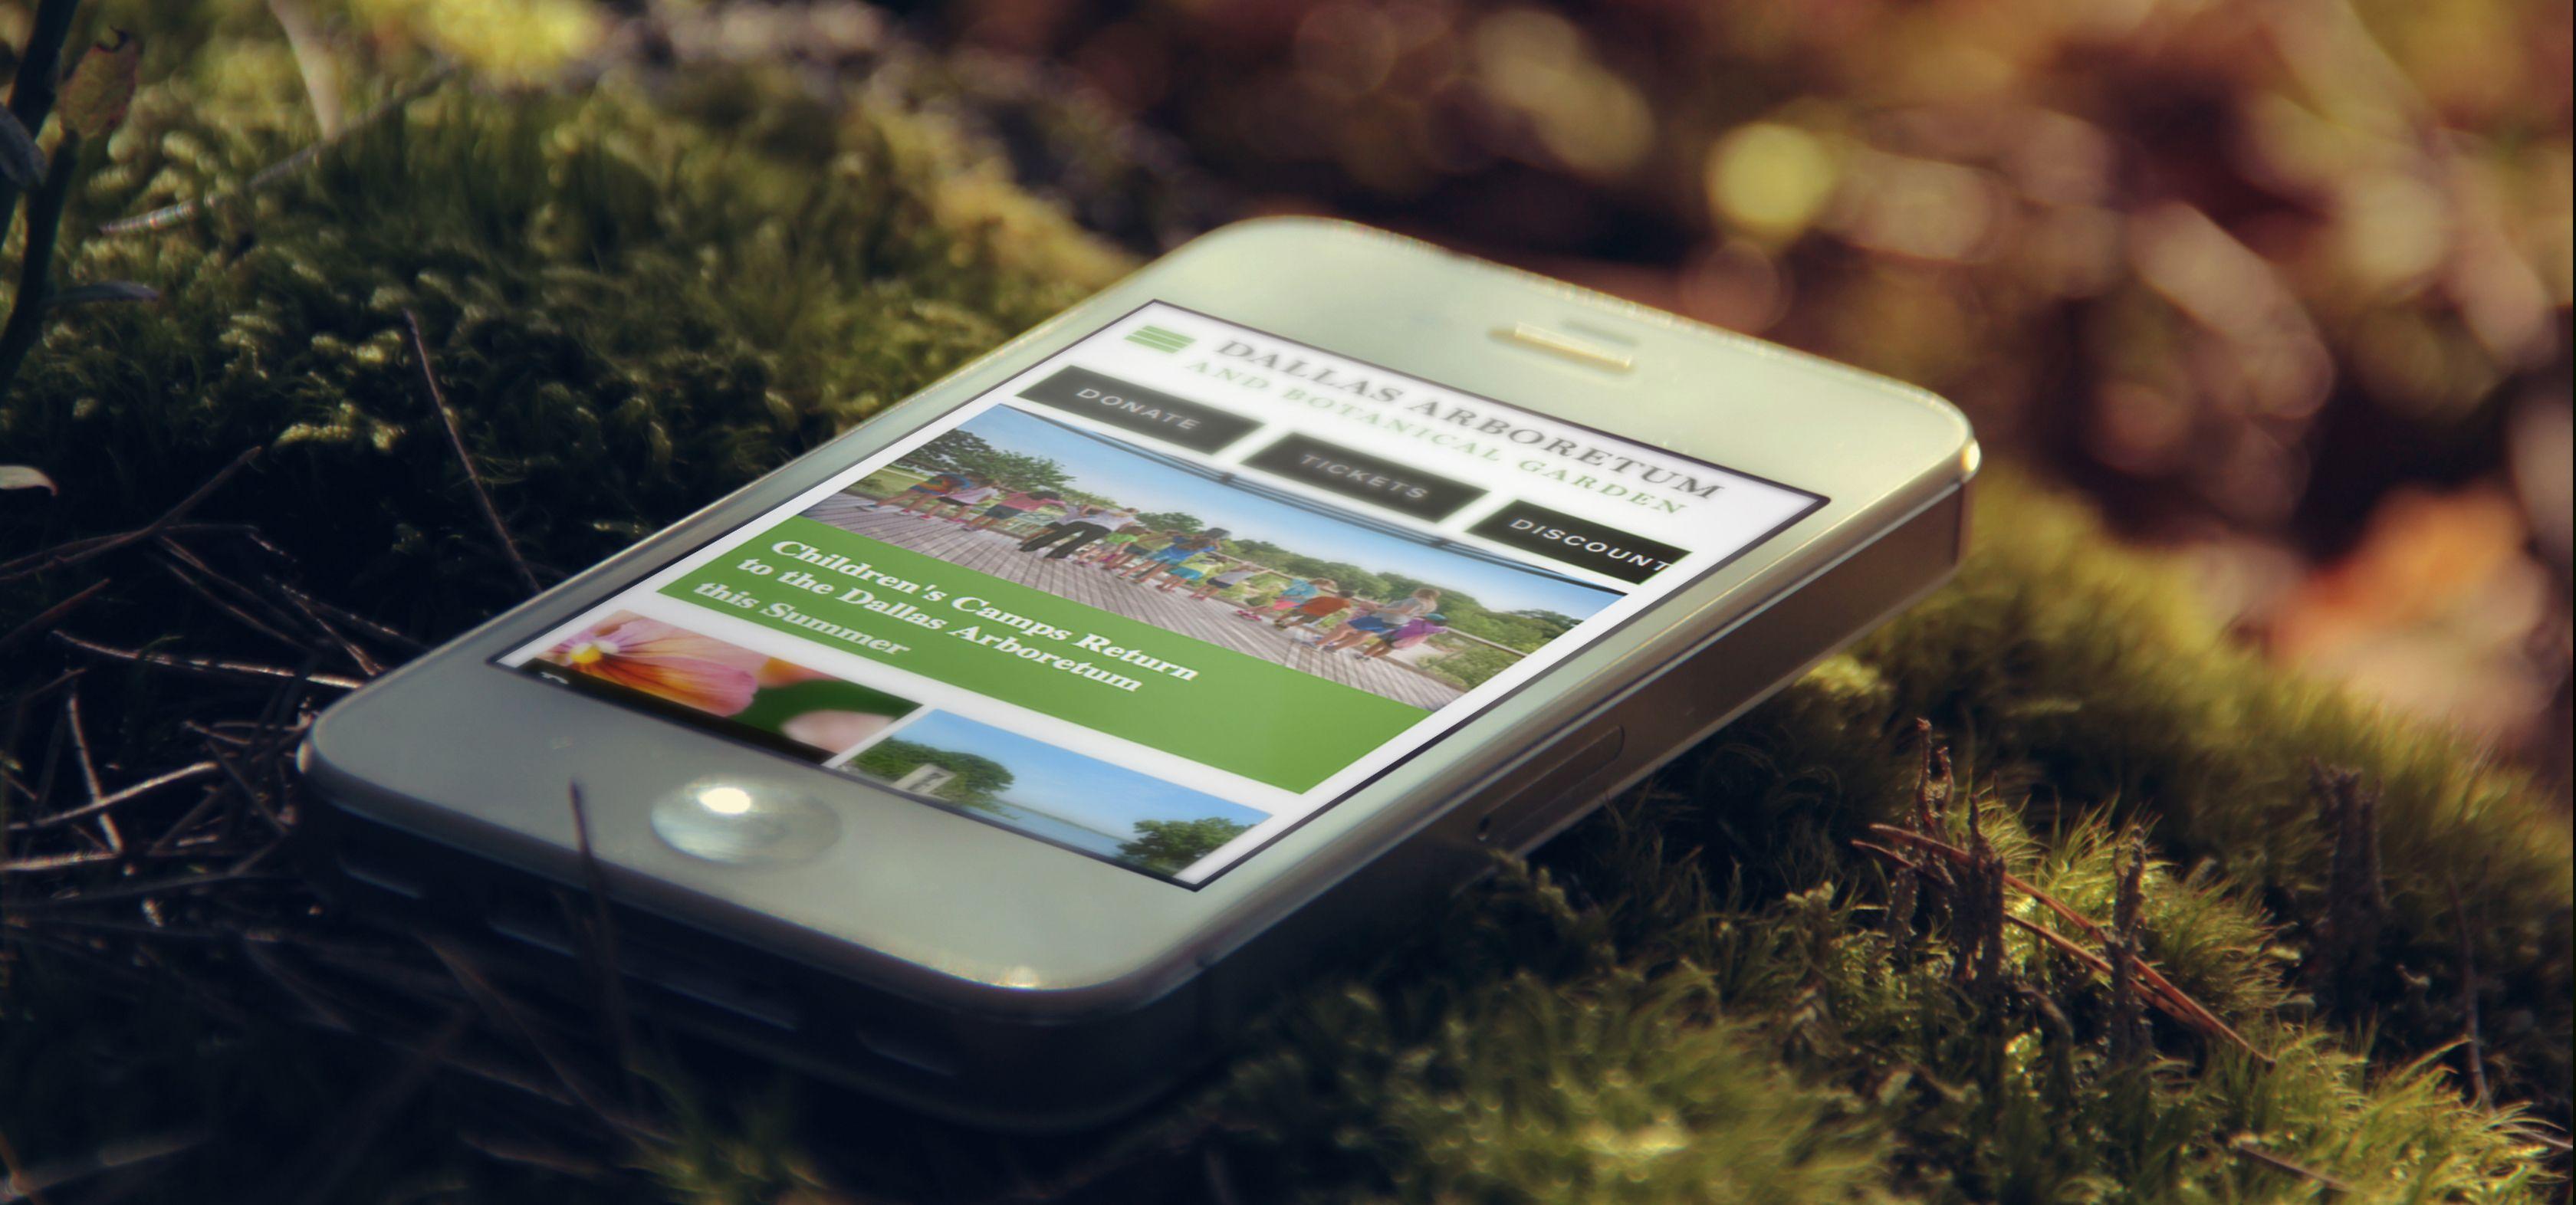 Dallas Arboretum. SERVICES Planning, Web Site and Game